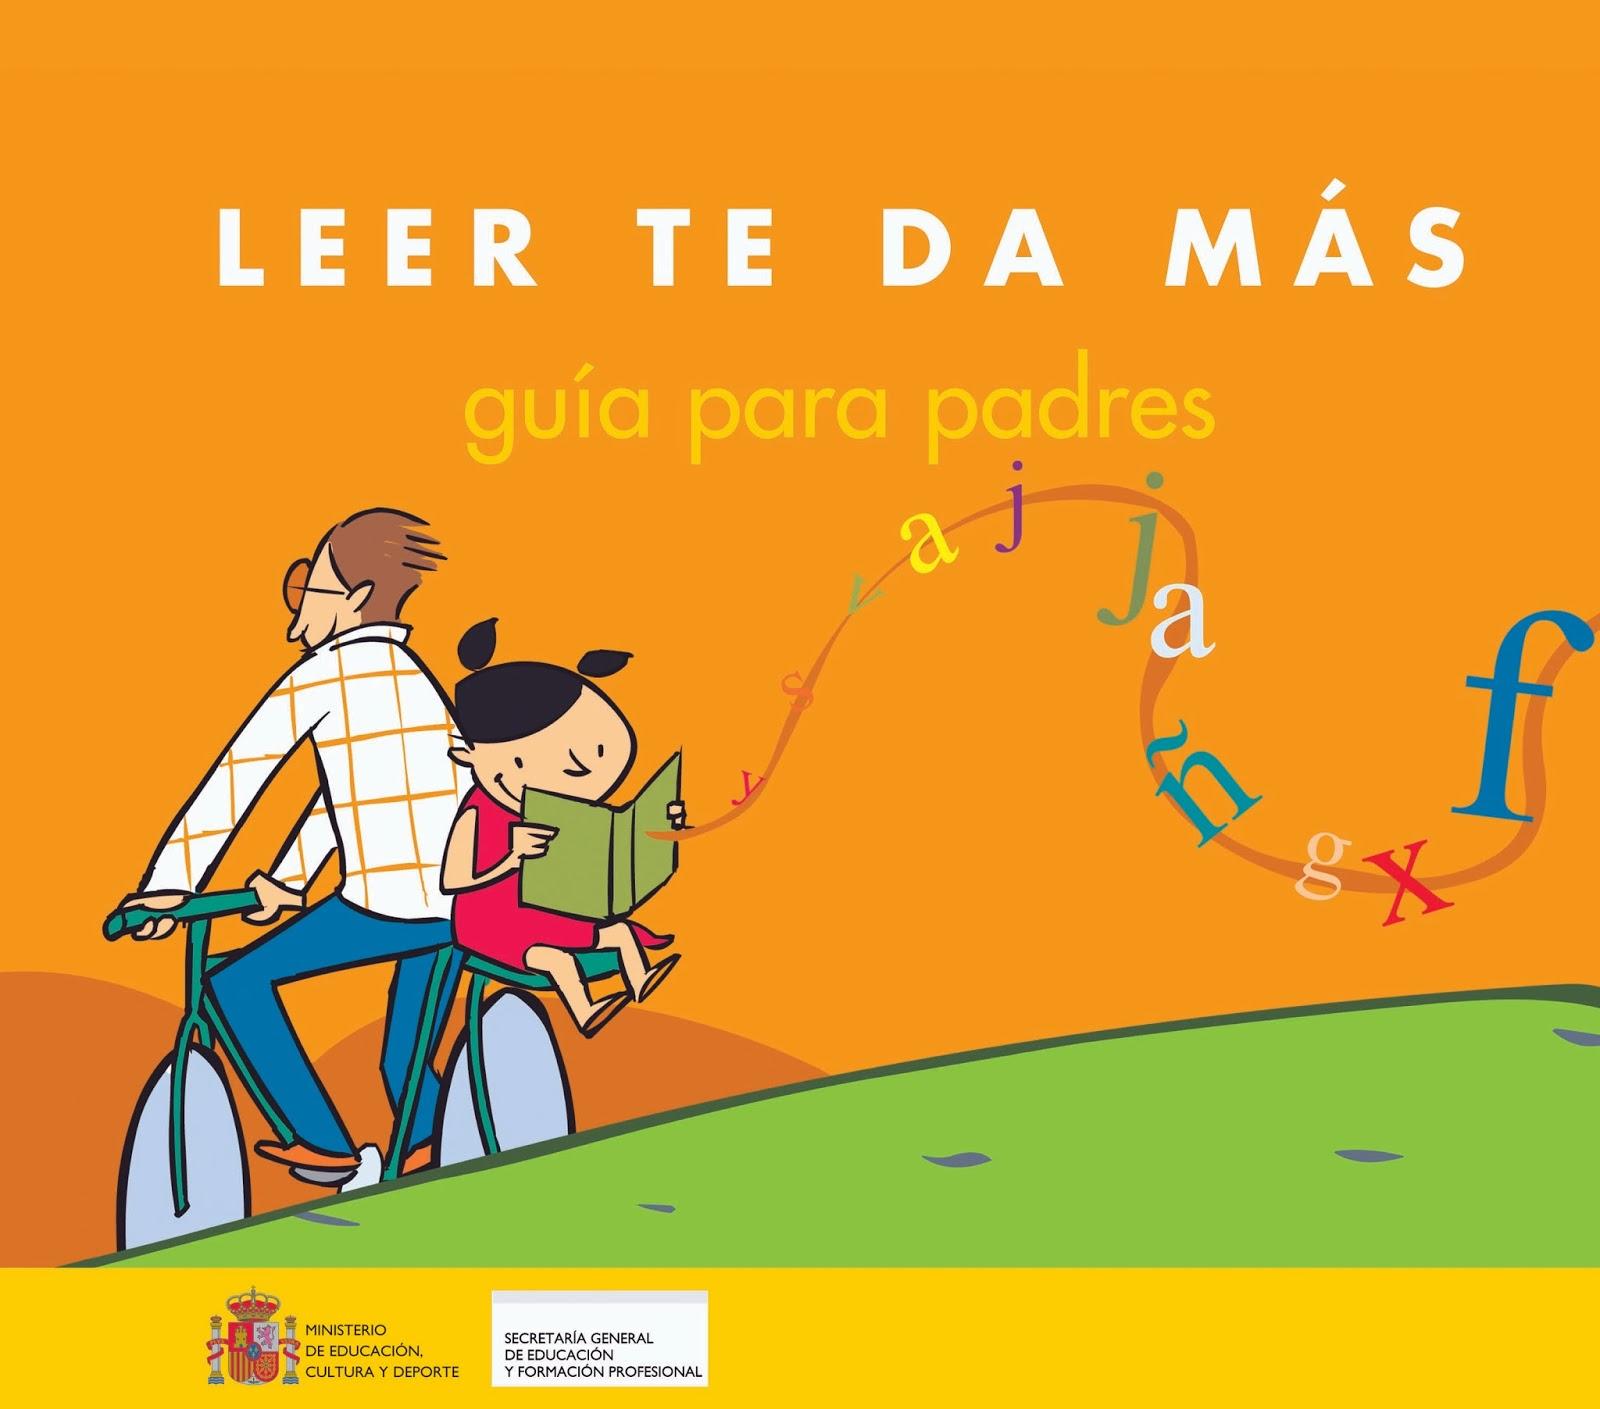 http://www.juntadeandalucia.es/averroes/ieslosalcores/Biblioteca/Leer%20te%20da%20m%C3%A1s.%20Gu%C3%ADa%20para%20madres%20y%20padres.pdf